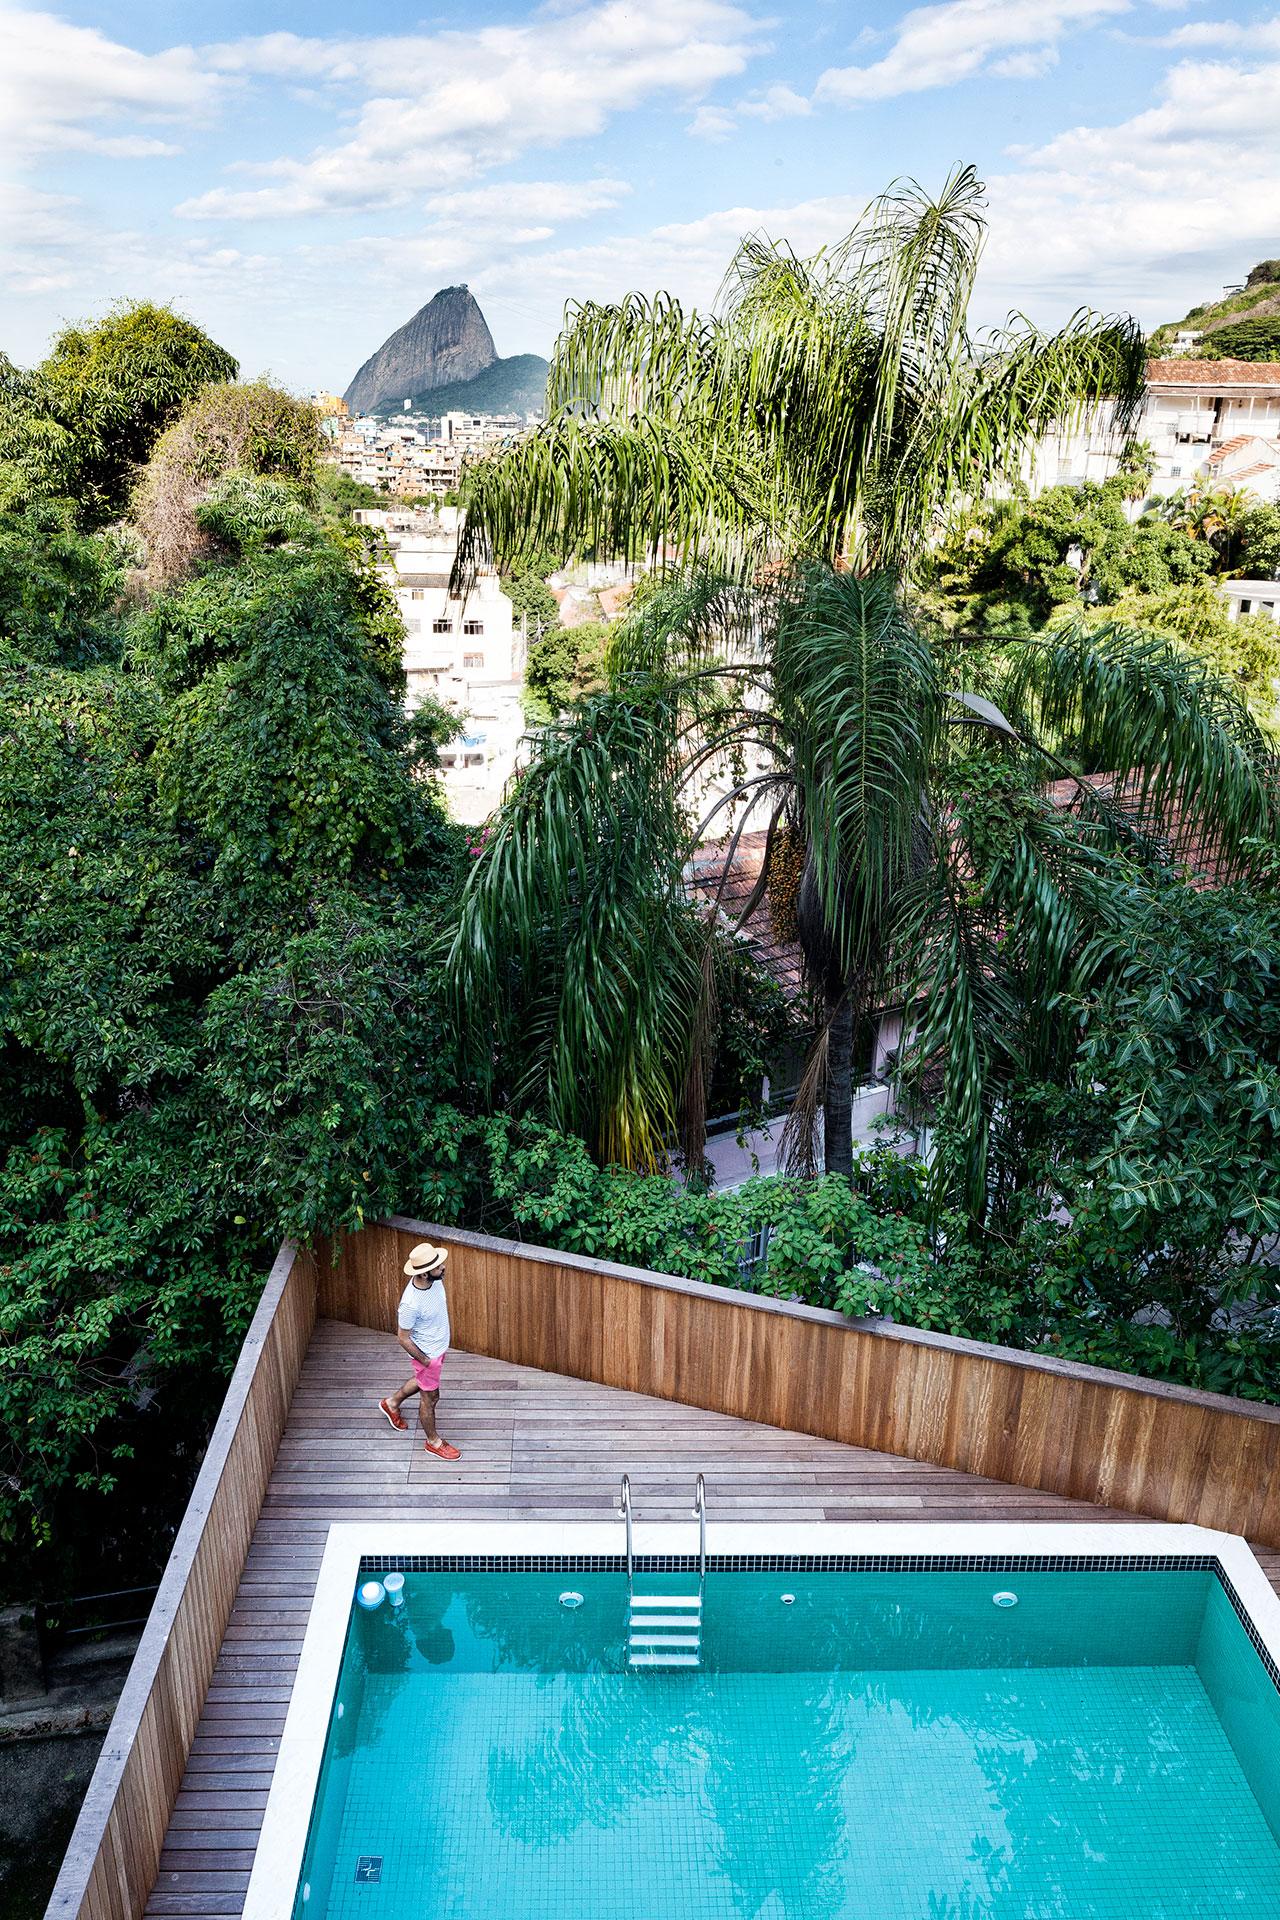 CasaJean MichelRuis,Rio de Janeiro, Brazil,by Jean Michel Ruis, photography byFilippo Bamberghi from Living under the Sun, © Gestalten 2015.